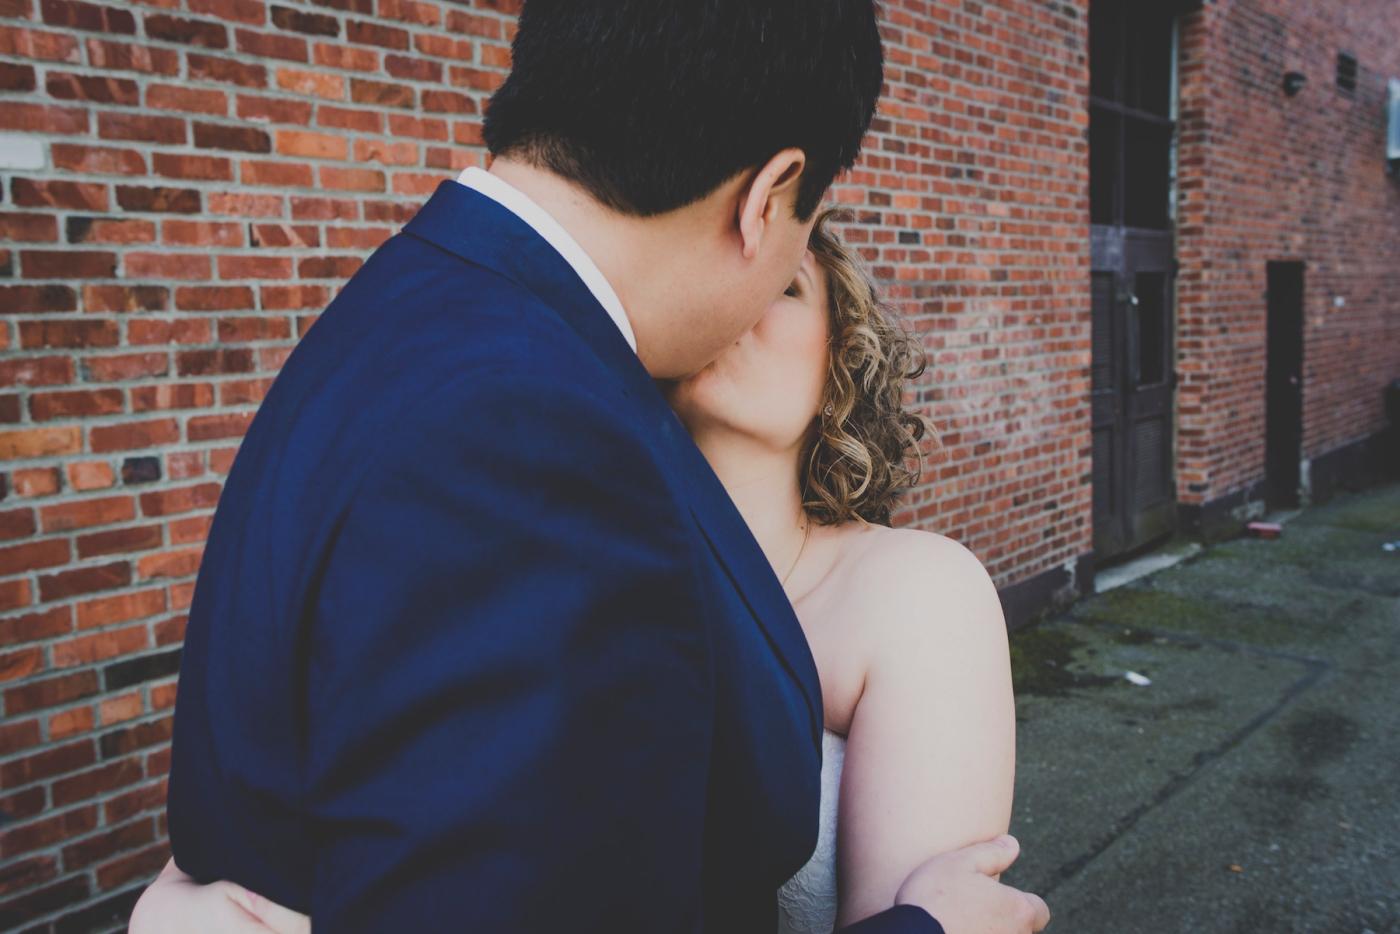 DSC_2132Everett_Wedding_Ballroom_Jane_Speleers_photography_Rachel_and_Edmund_Bridesmaids_peach_dresses_groomsmen_2017